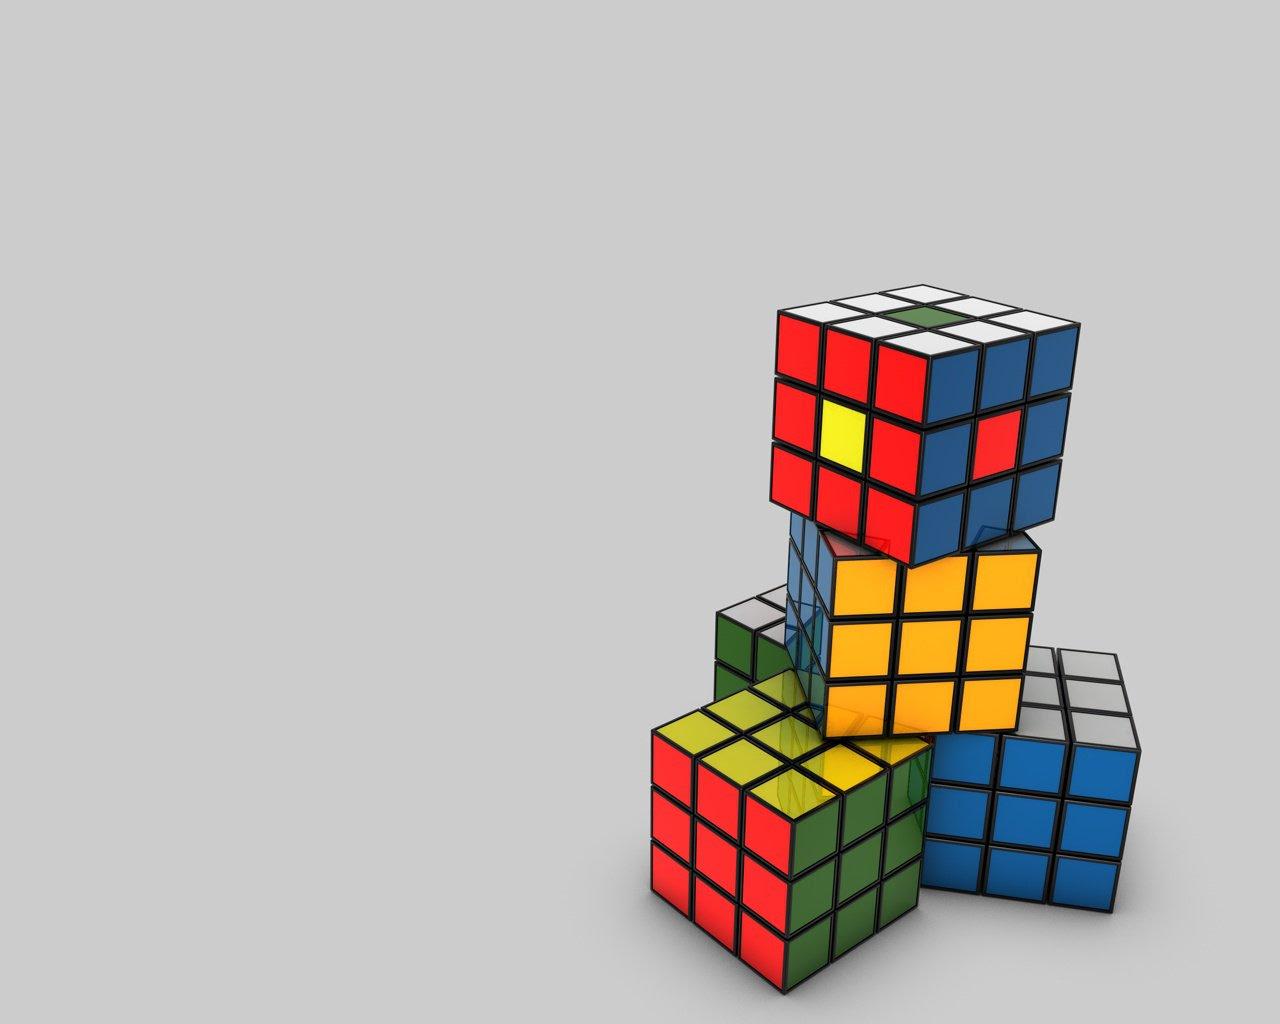 Rubiks Cube Wallpaper Sf Wallpaper Images, Photos, Reviews